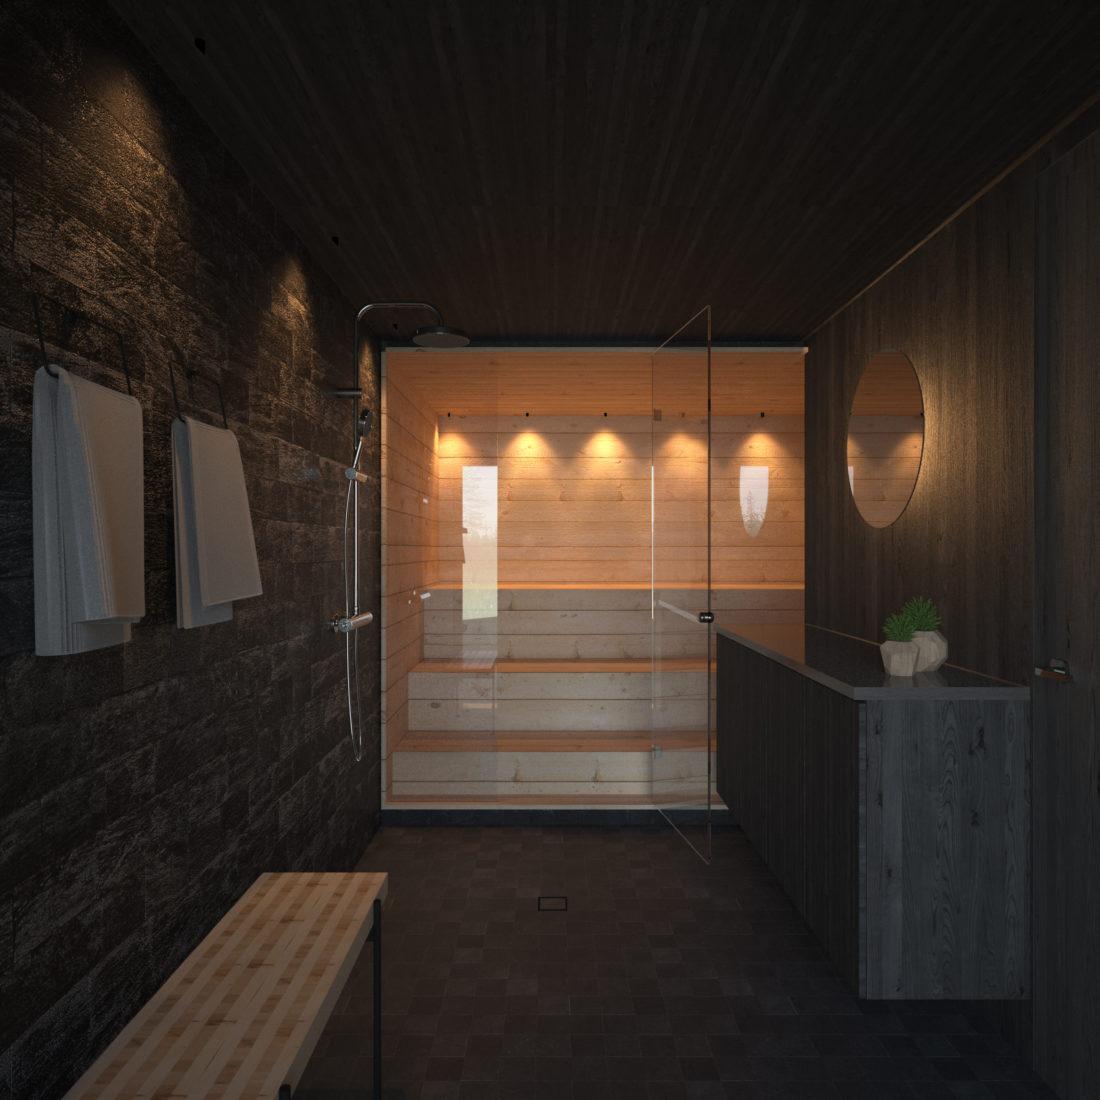 sauna interior render